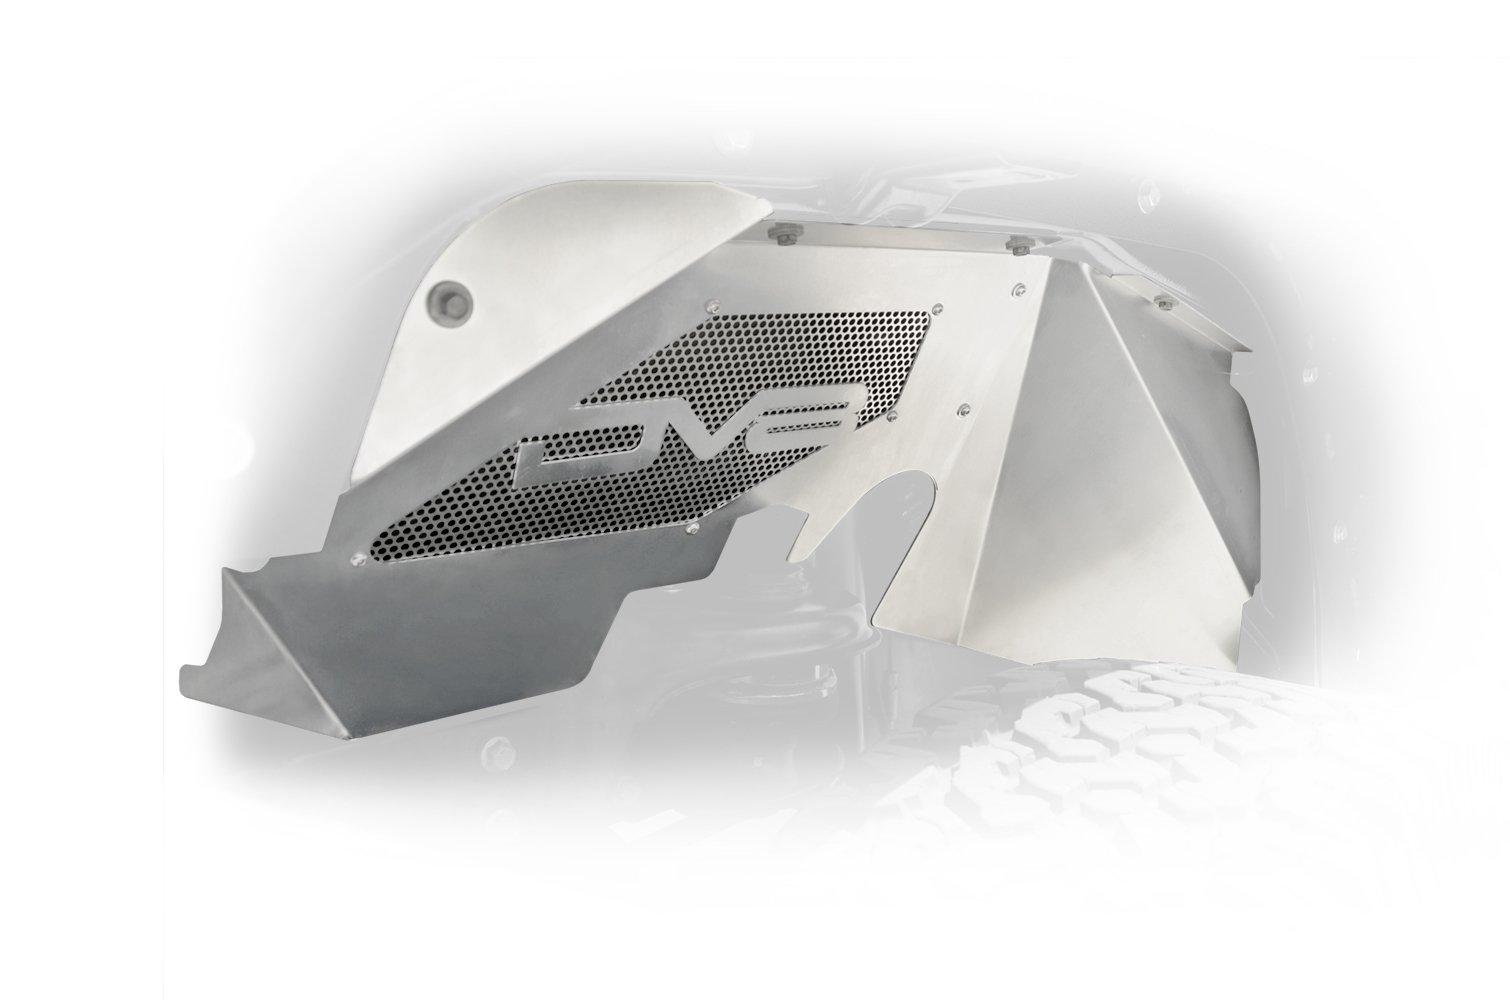 Jeep JK Inner Fender Front Raw 07-18 Wrangler JK Aluminum DV8 Offroad